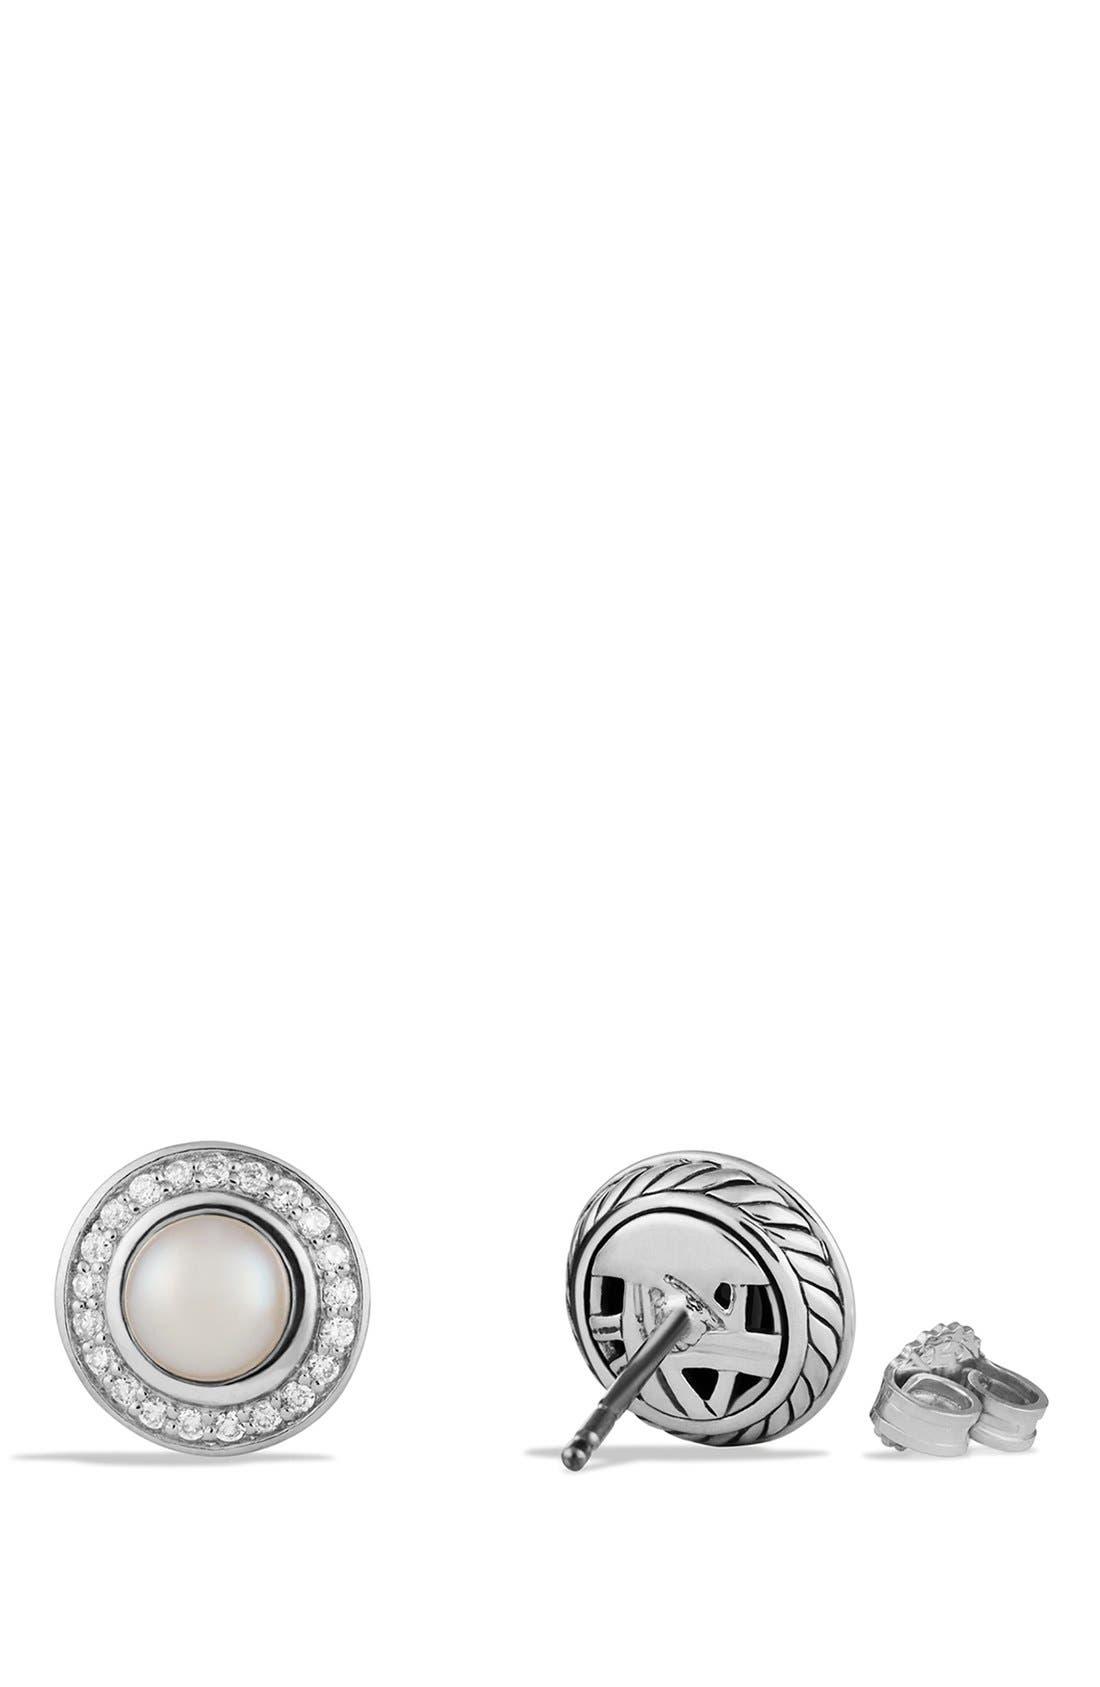 Alternate Image 2  - David Yurman 'Cerise' Mini Earrings with Semiprecious Stone & Diamonds